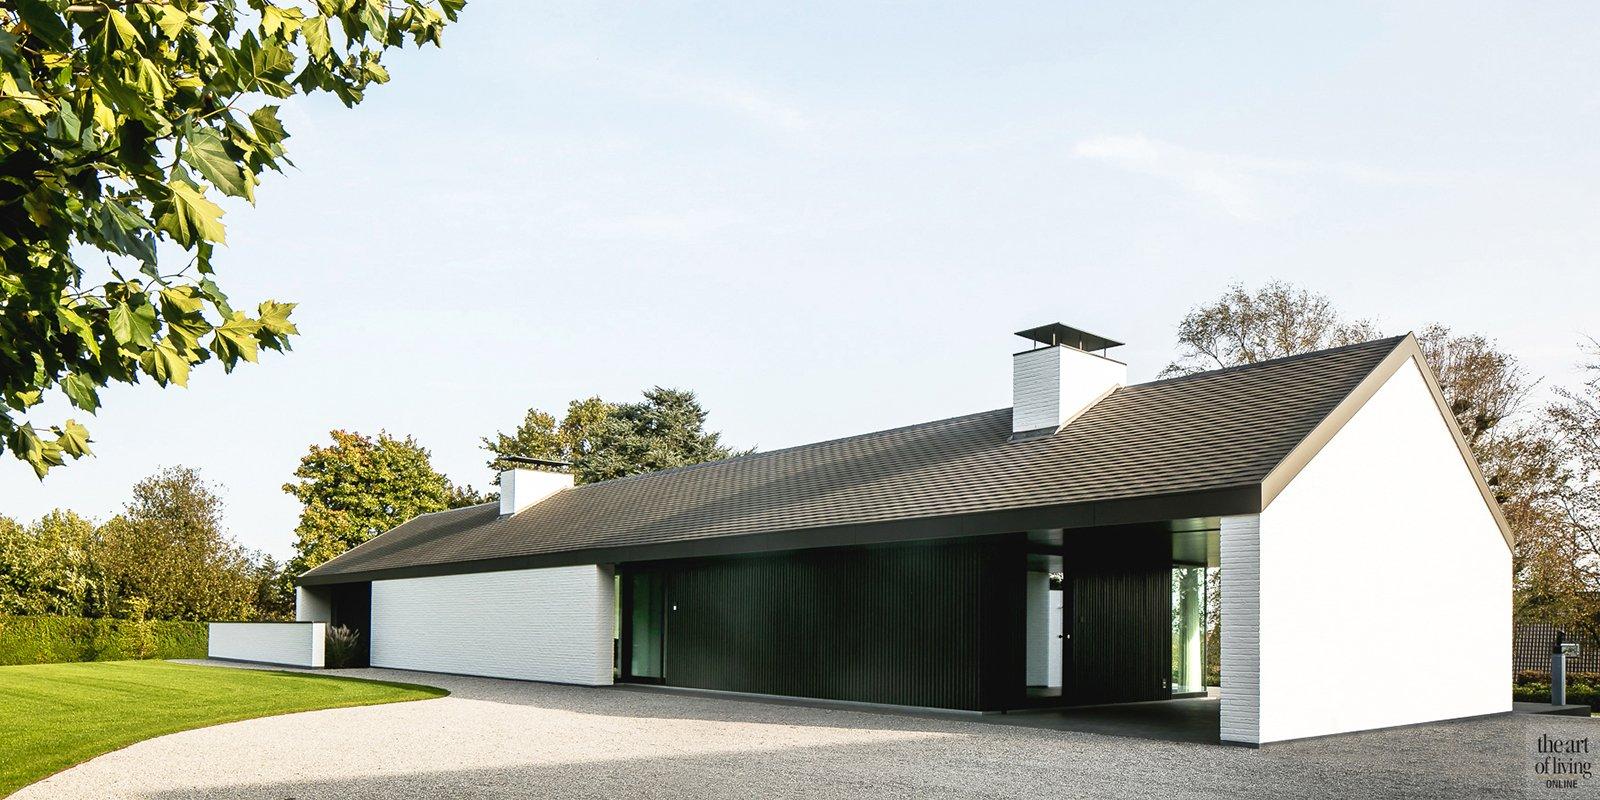 Moderne luxe villa, Architectuuratelier De Jaeghere, glaspartij, achterzijde, luifel, zwart hout